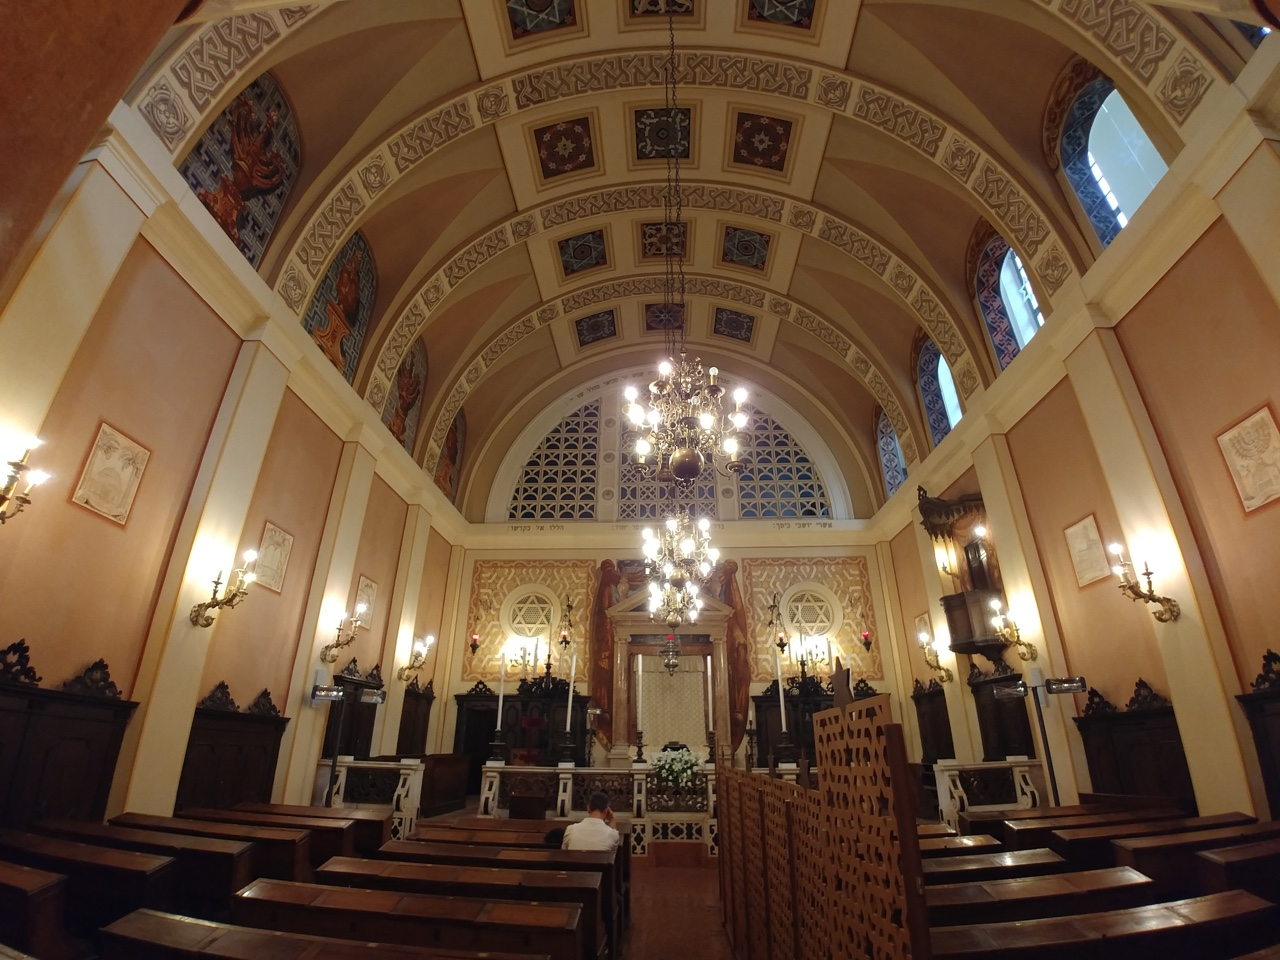 Sinagoga Ebraica Verona 5a